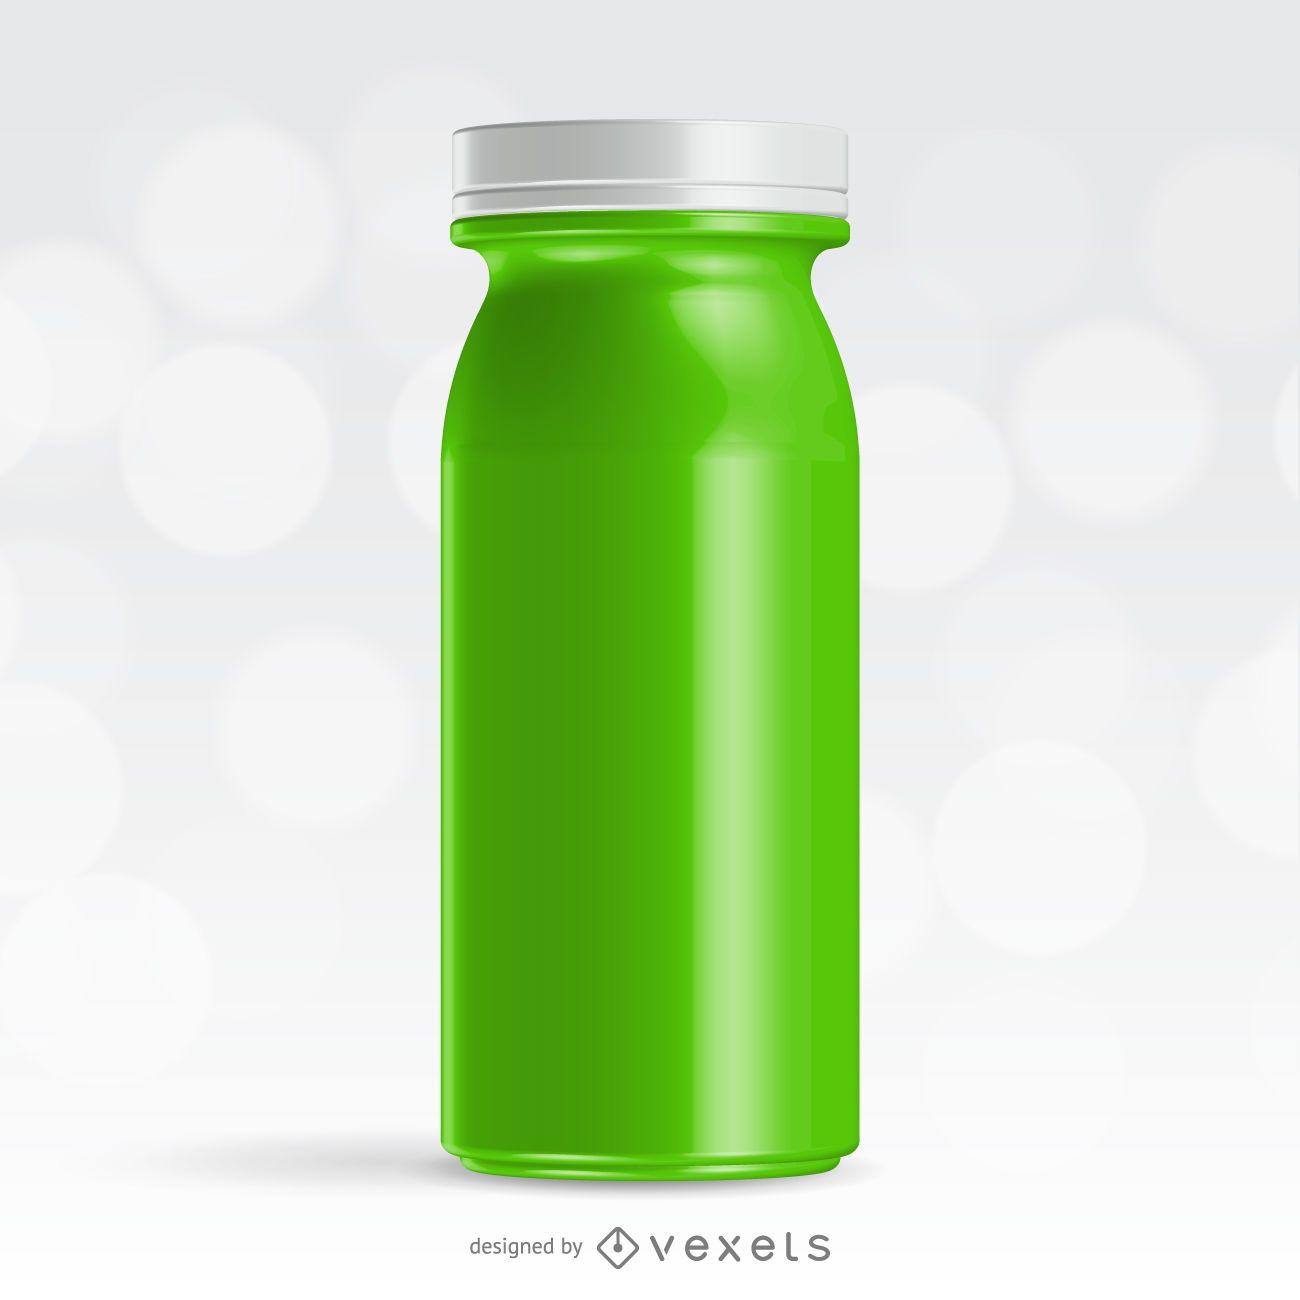 soda bottle mockup template vector download